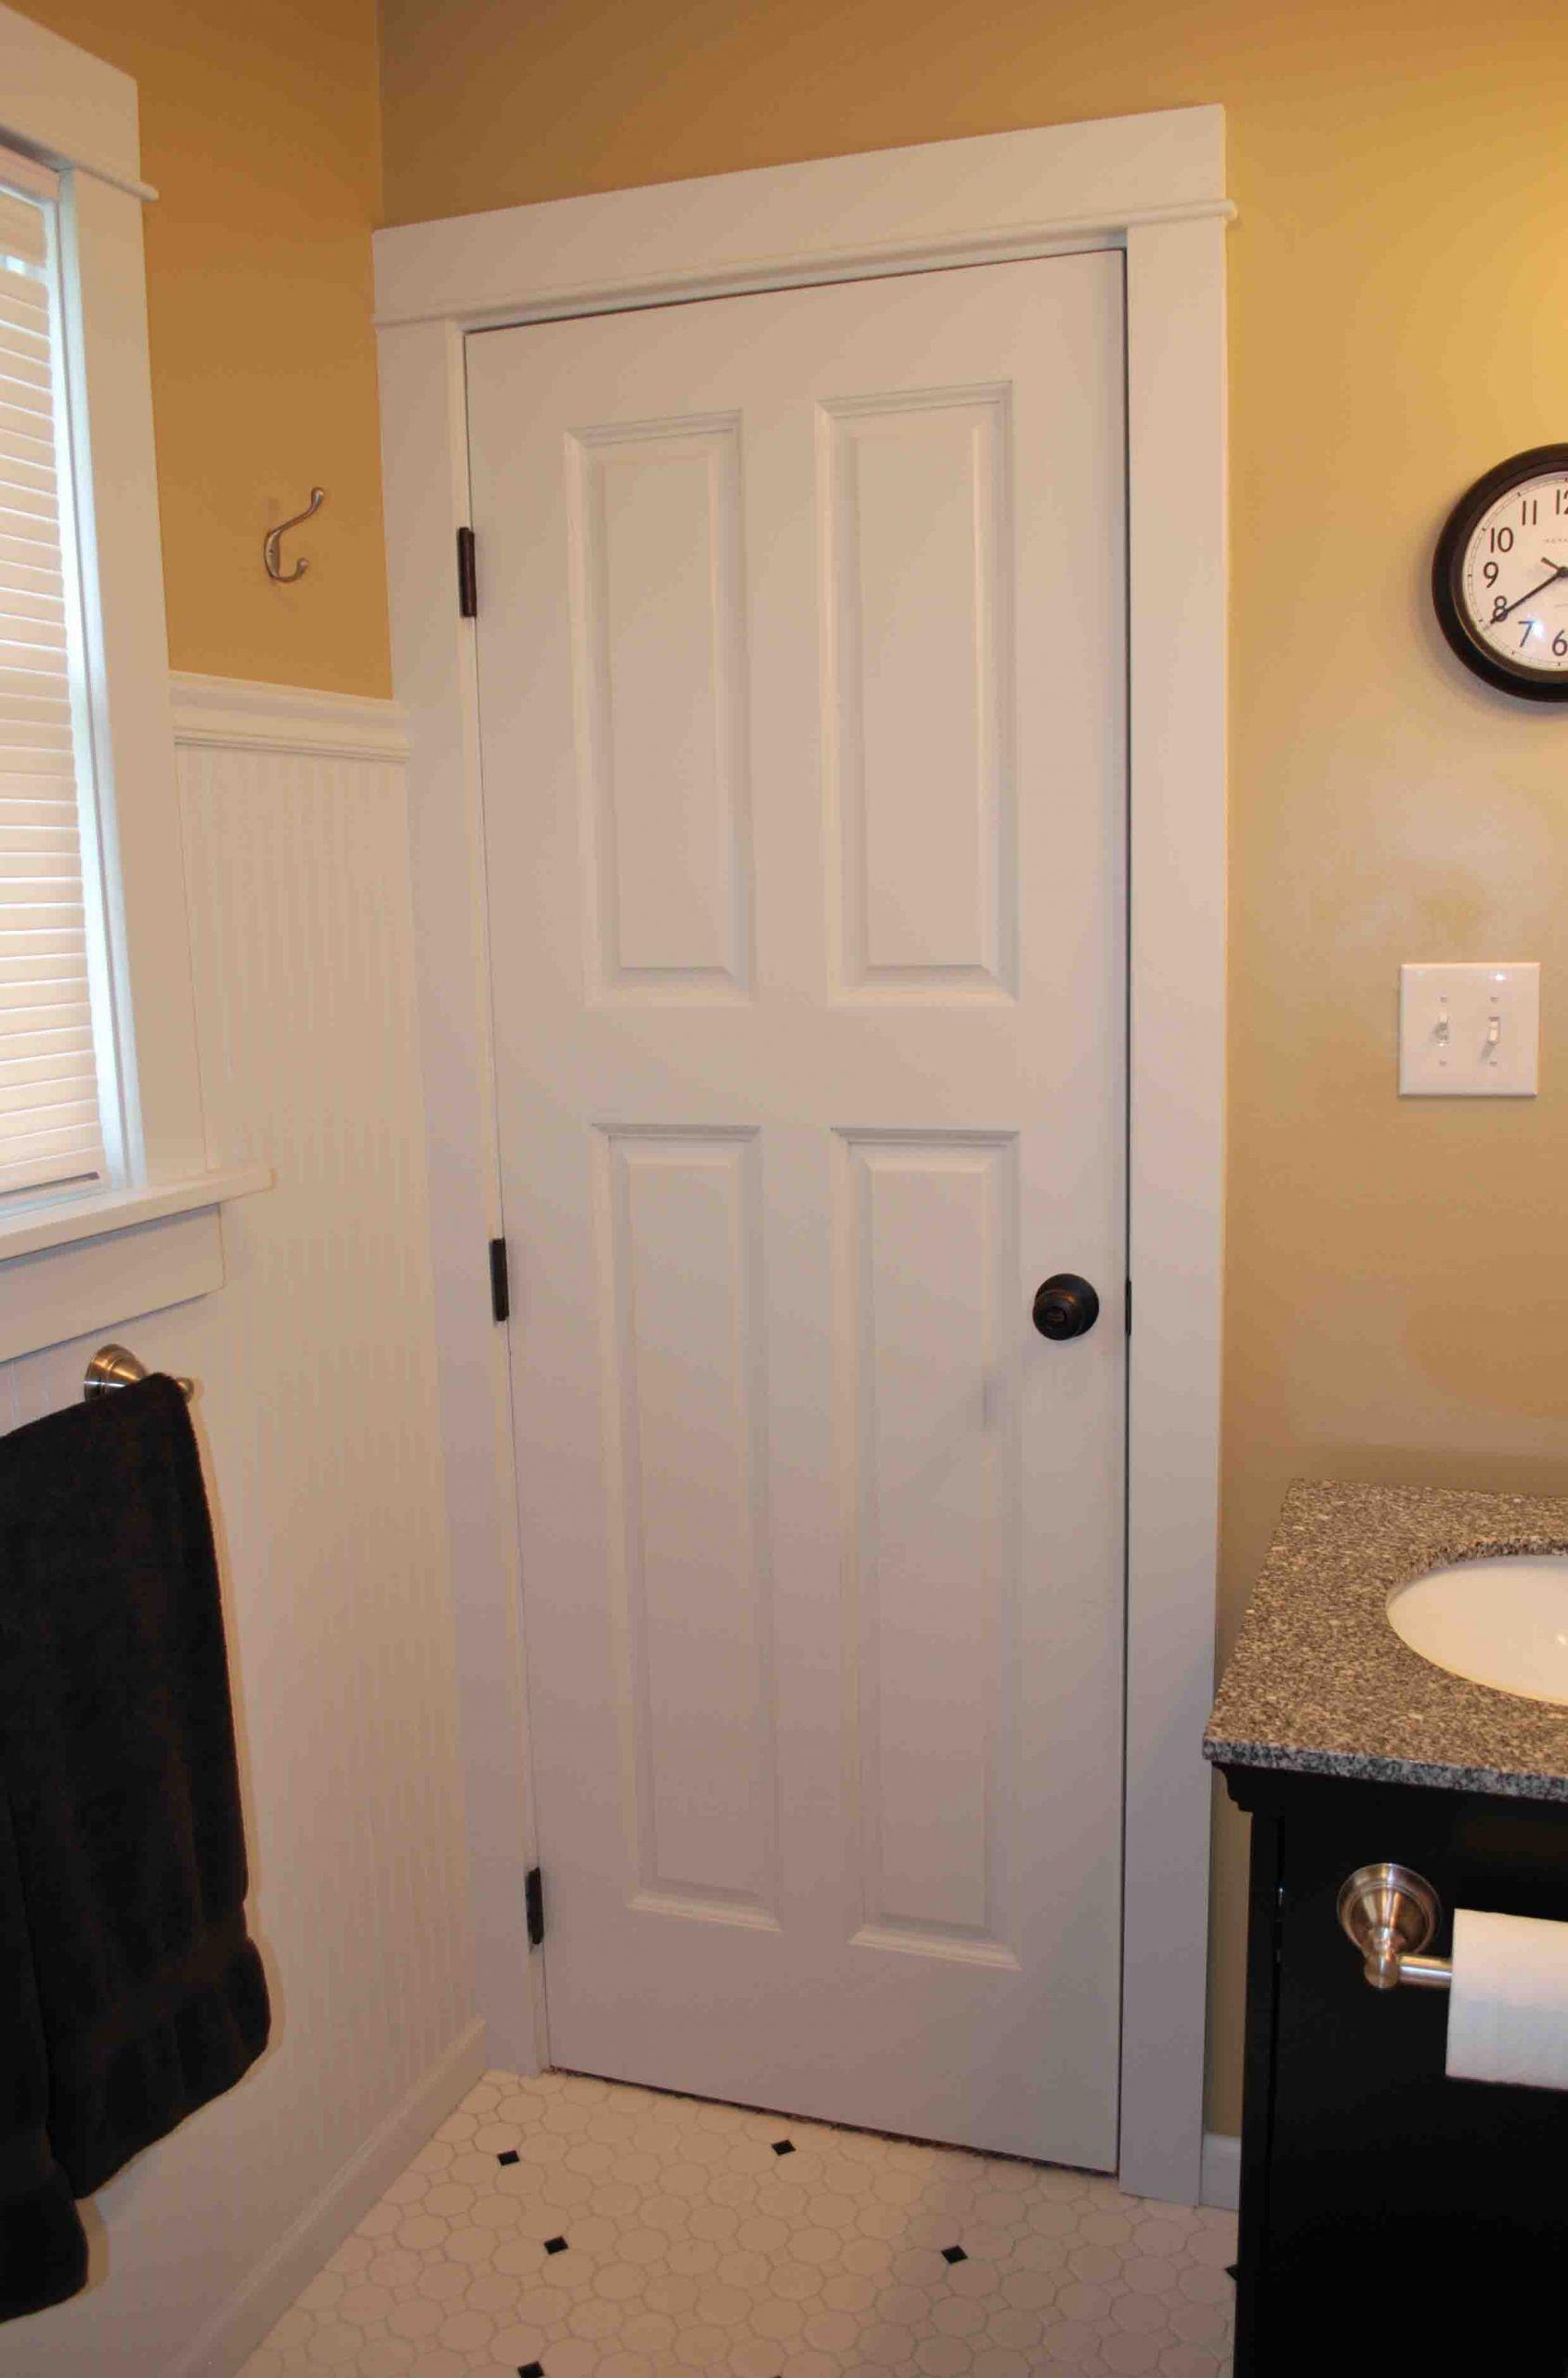 Bathroom Door Design  Dos and Don ts of DIY Part 2